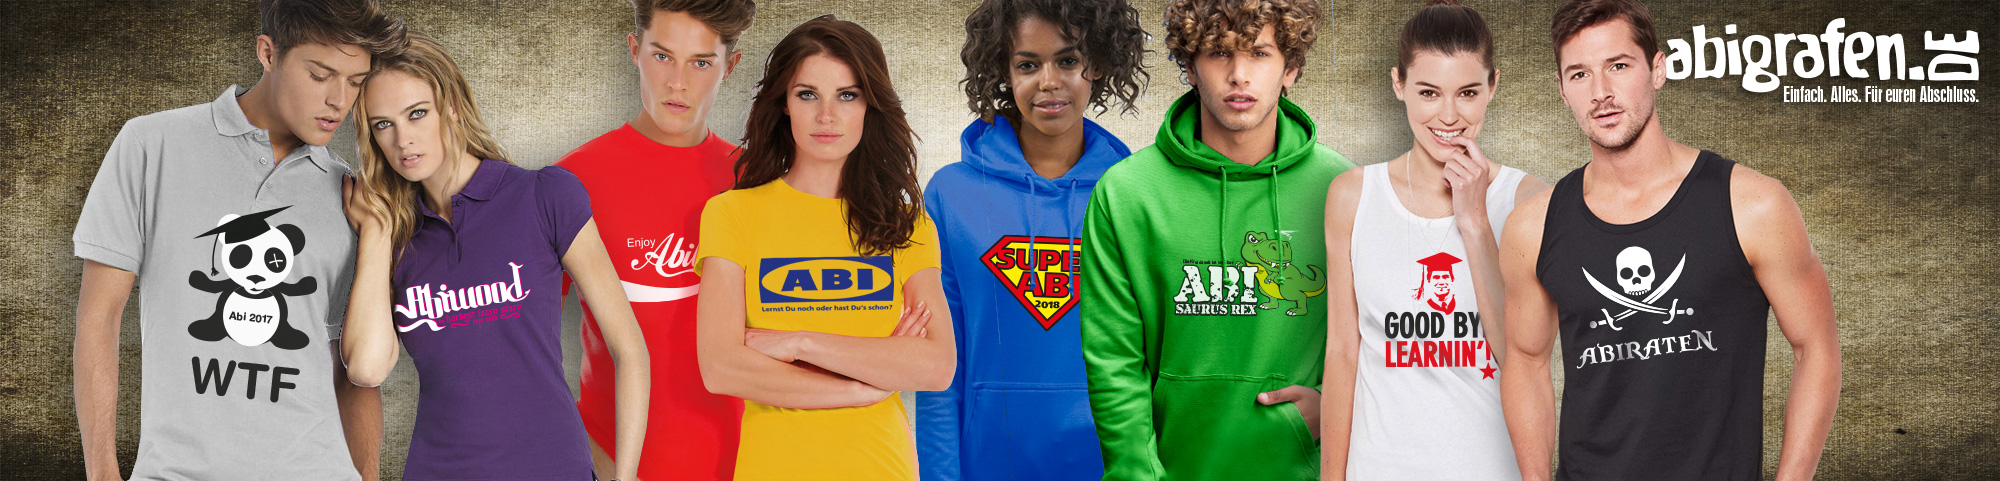 Abi-Textilien bedrucken: Hoodies, Tops, Polos, Sweatshirts, Pullis, Abschlussshirts